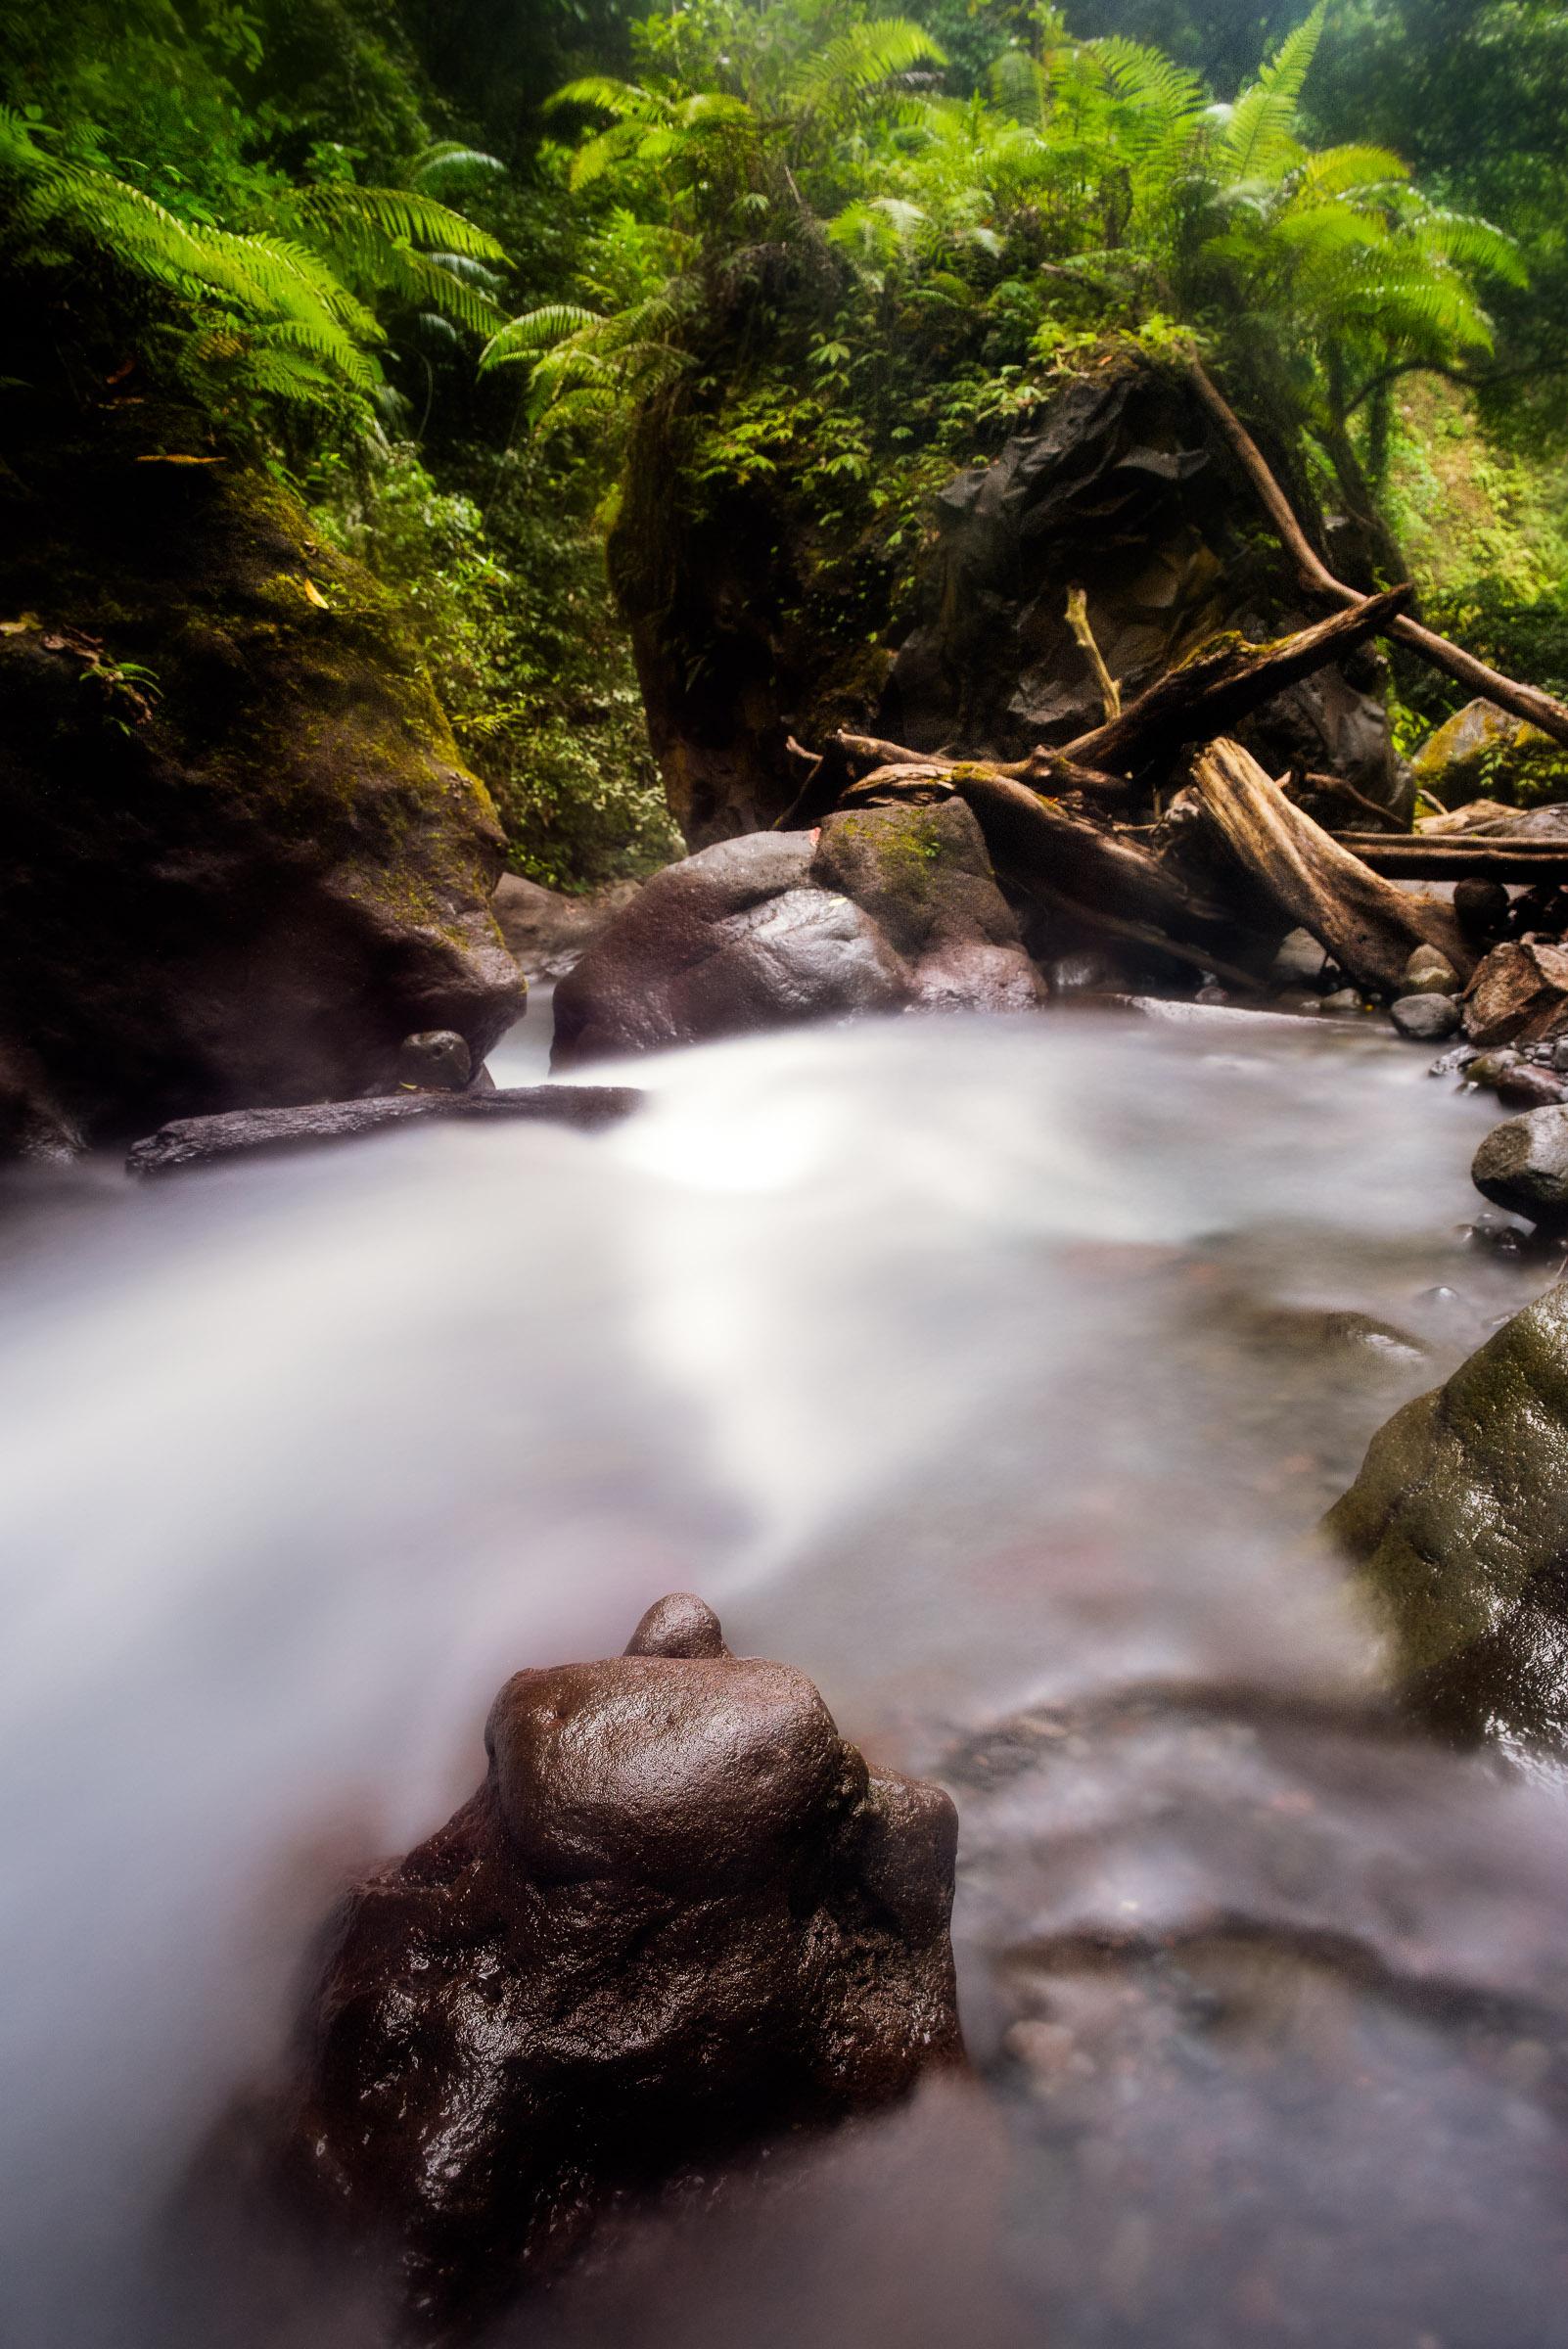 Tiu Kelep Creek - Iksa Menajang